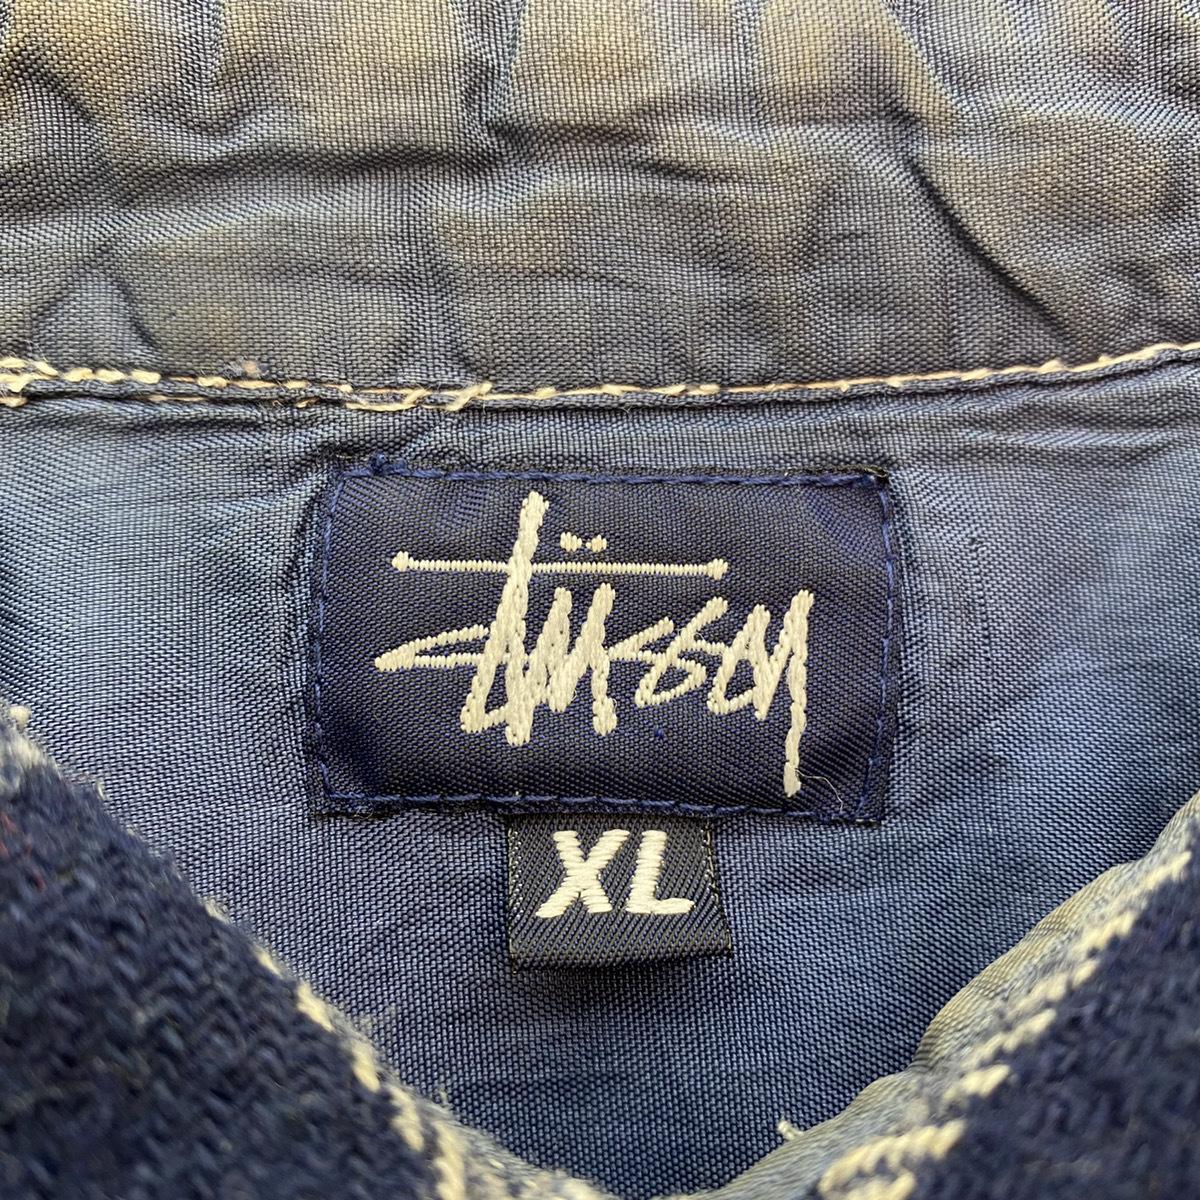 ●Stussy ステューシー OLD Stussy オールドステューシー 90s 90年代 紺タグ チェック ウール シャツ USA製 MADE IN USA 104_画像8